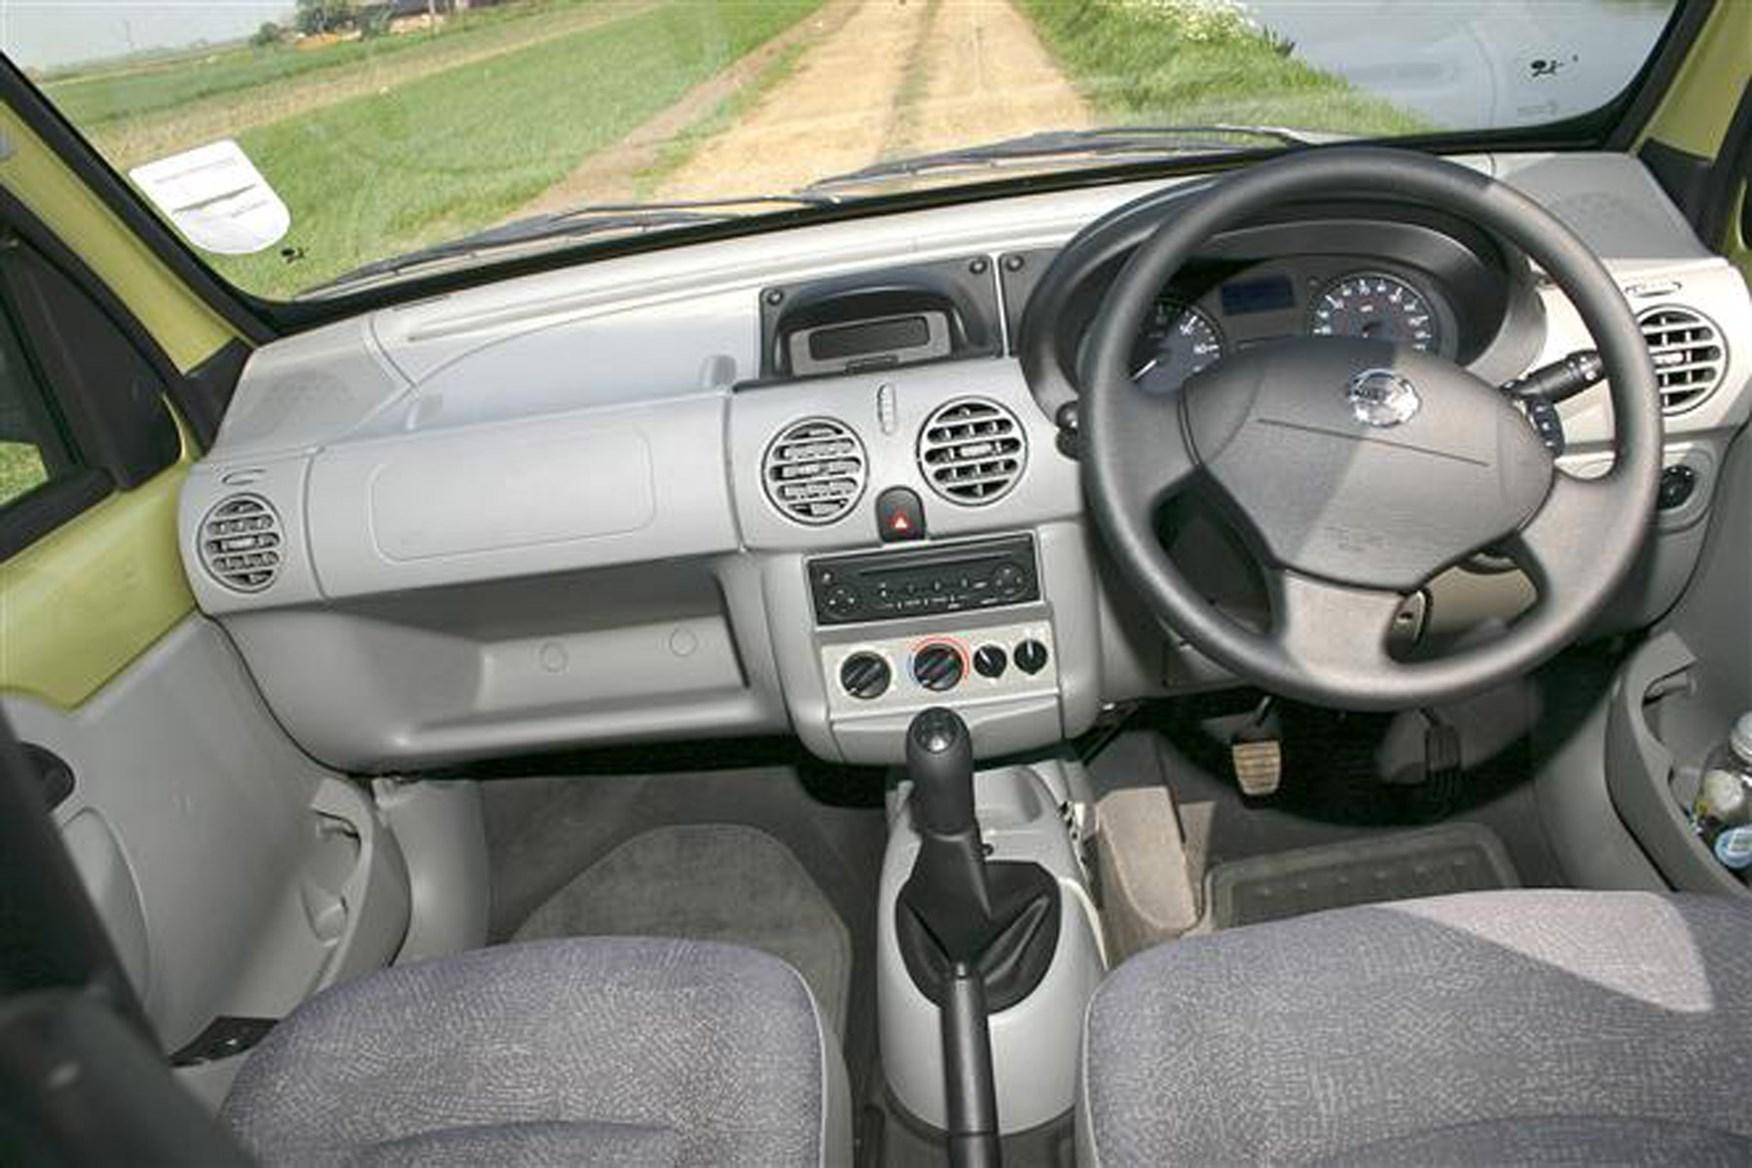 Nissan Kubistar review on Parkers Vans - interior